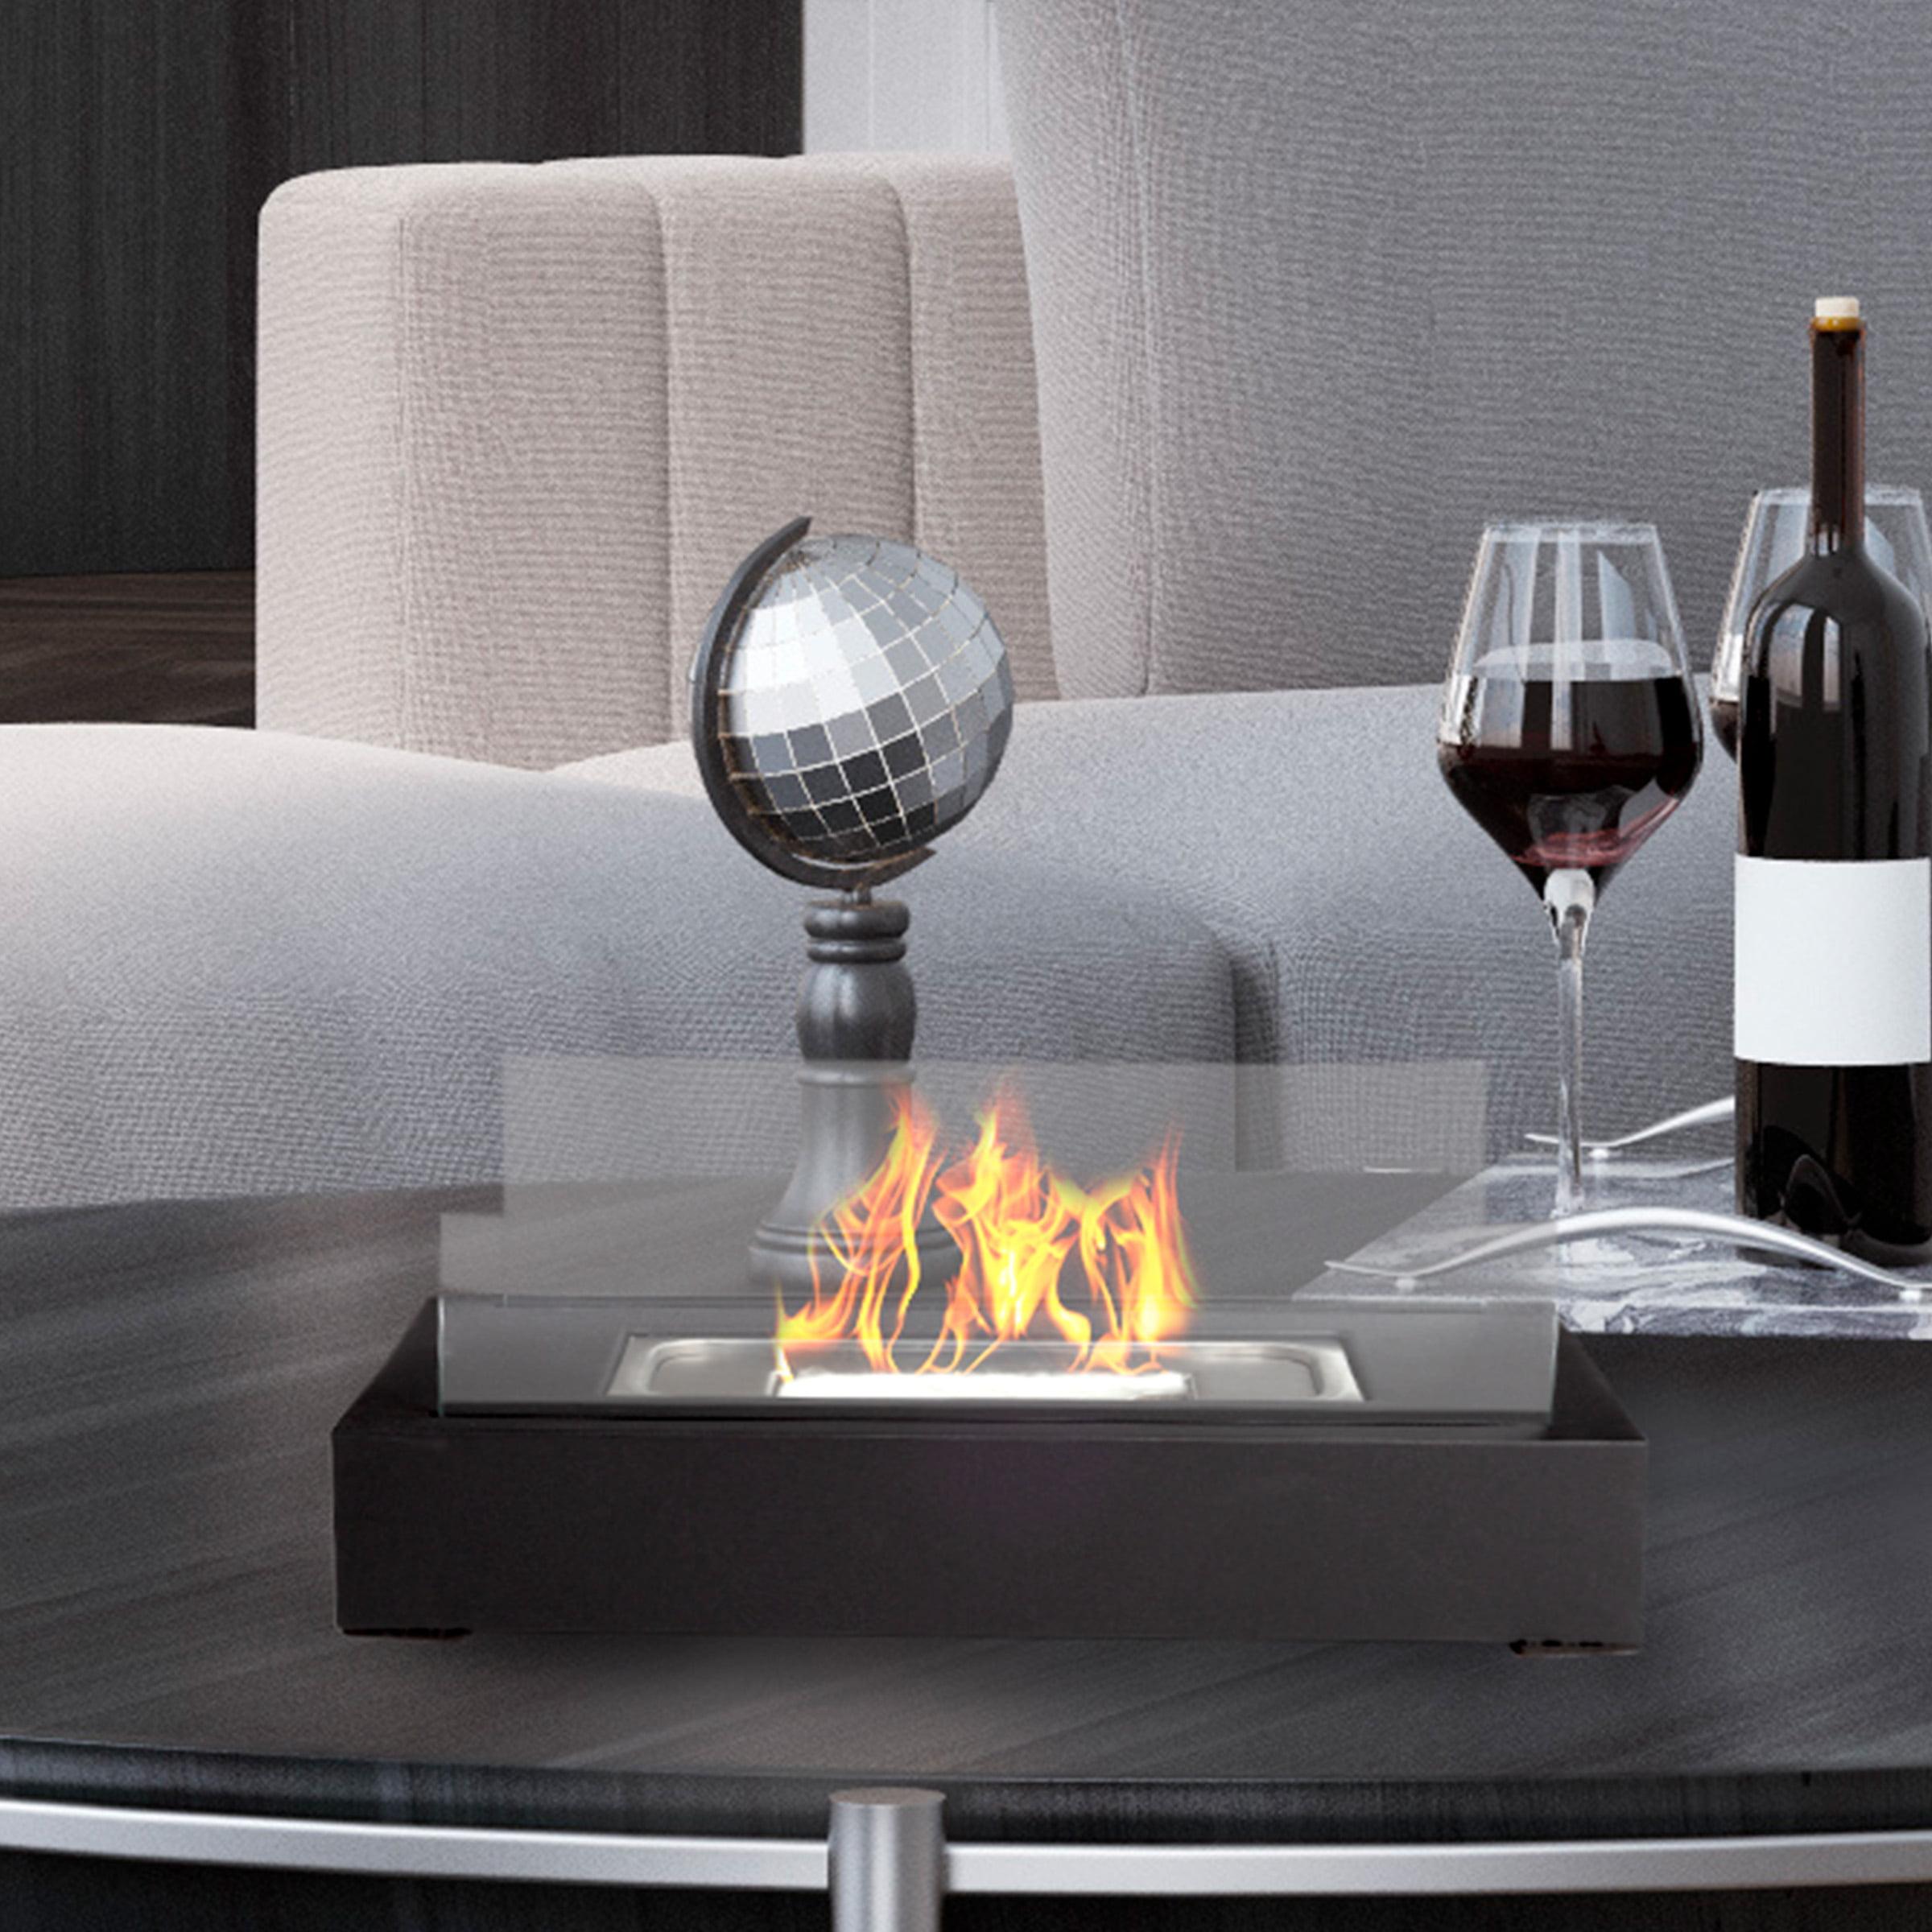 Bio Ethanol Ventless Fireplace Tabletop Rectangular Real Flame